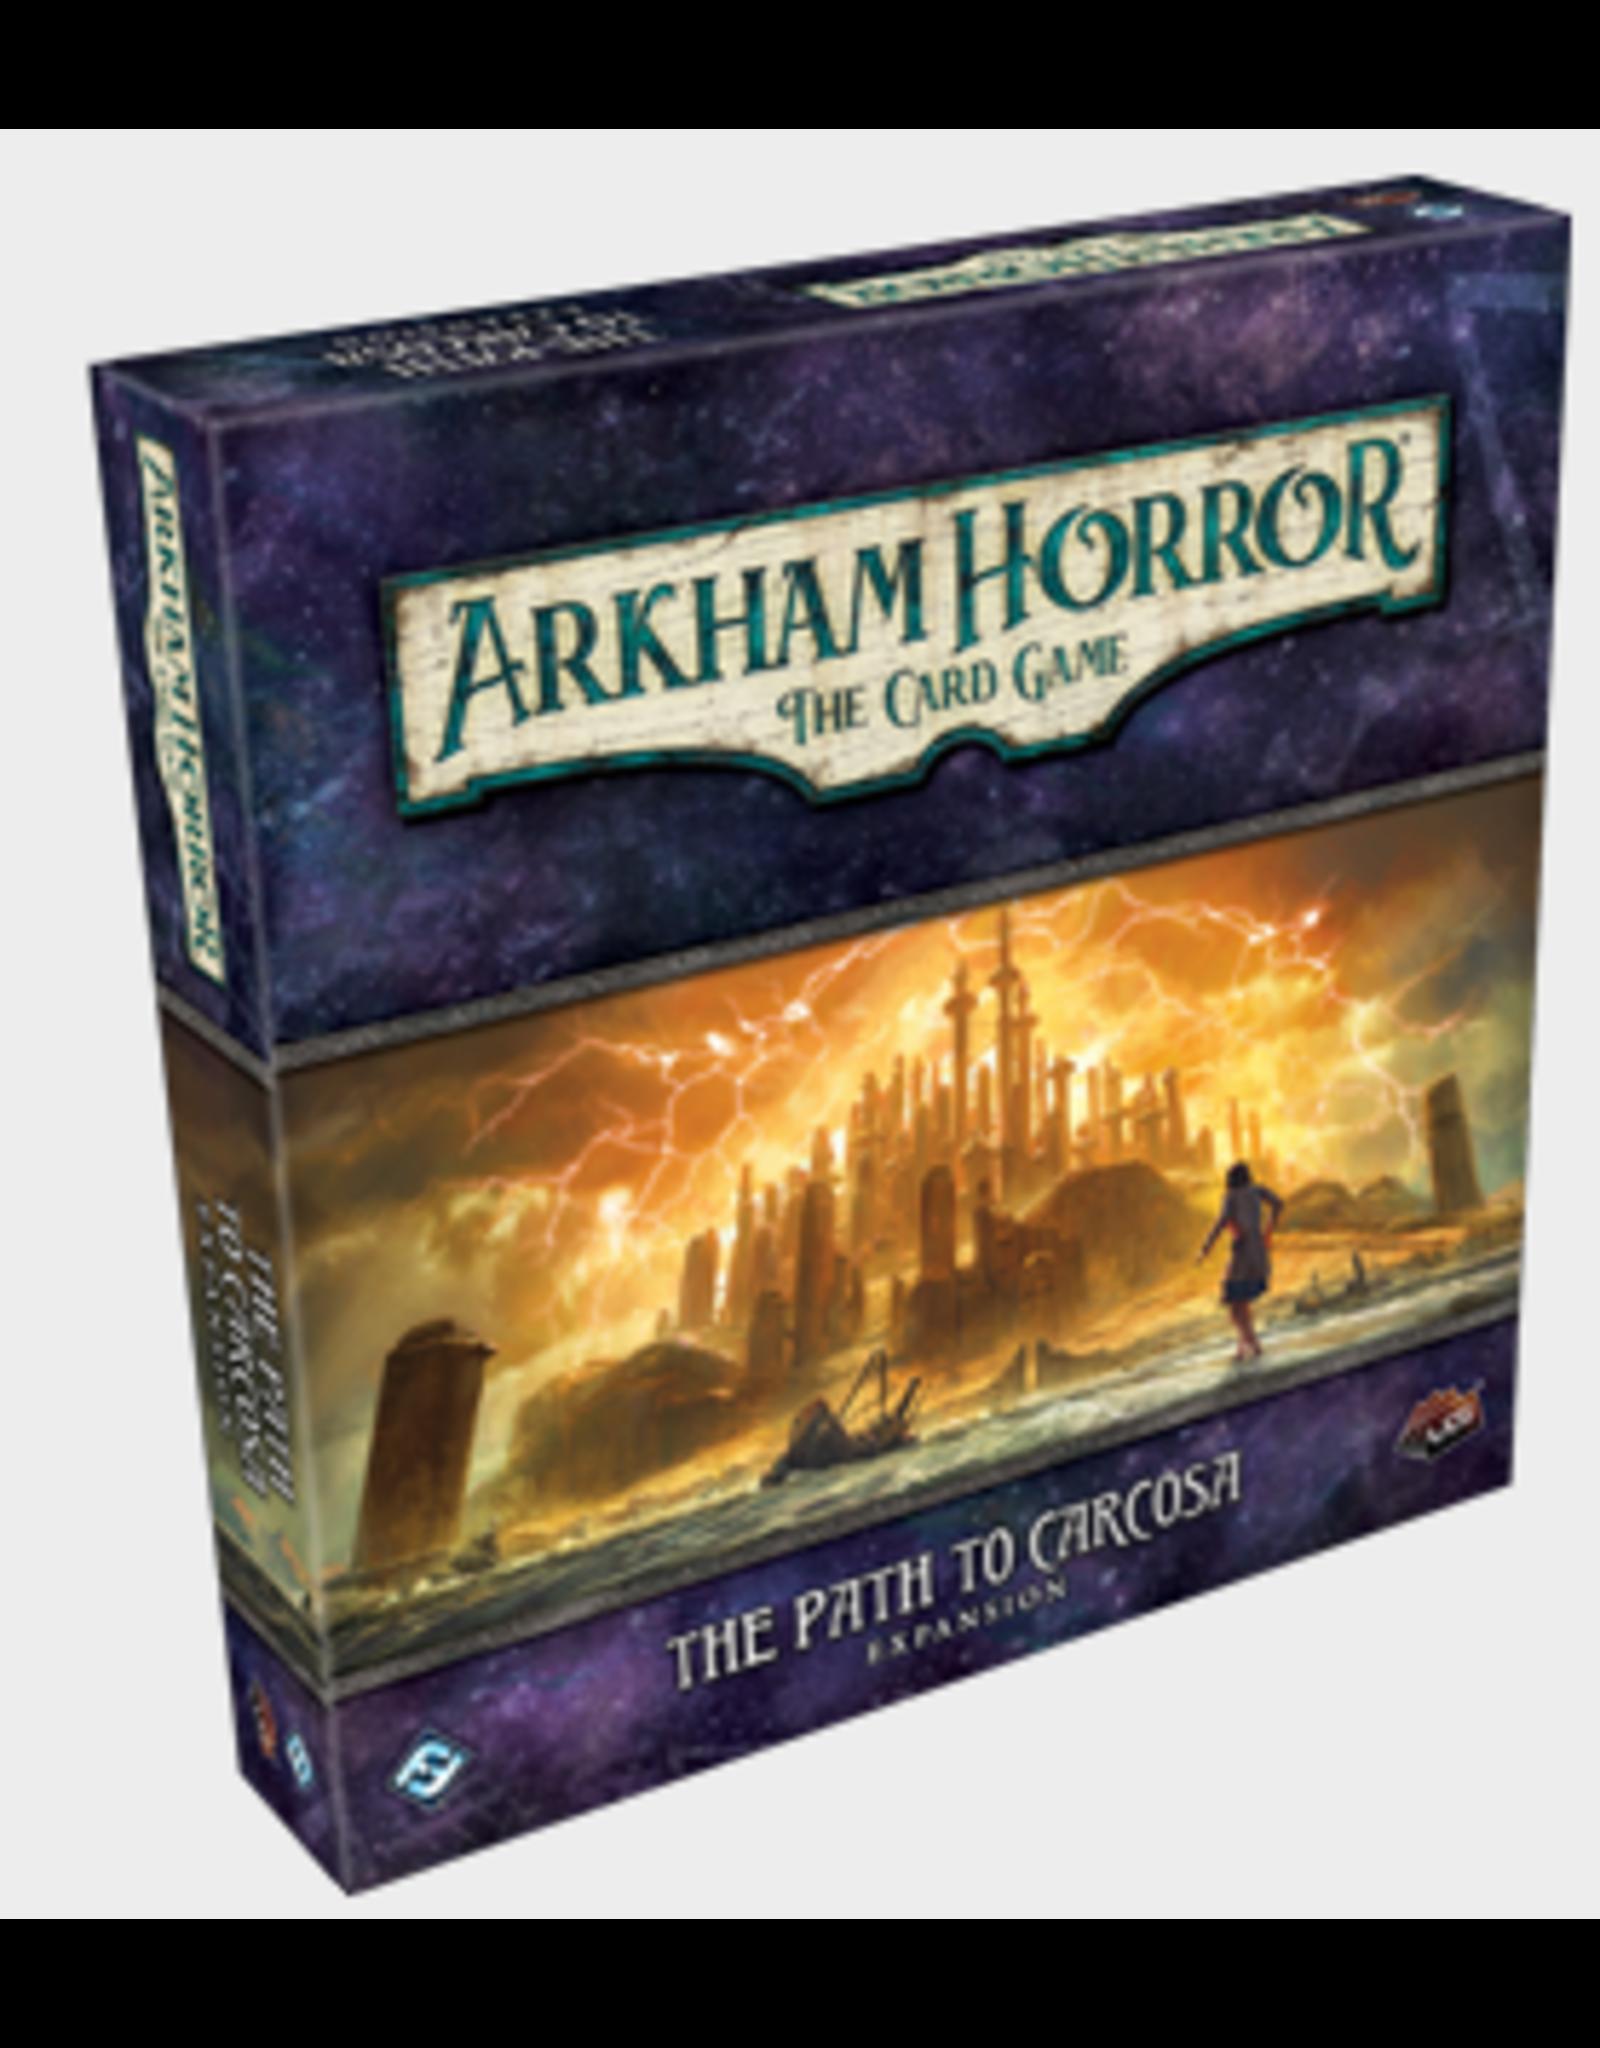 Fantasy Flight Games Arkham Horror LCG: Return to the Path to Carcosa